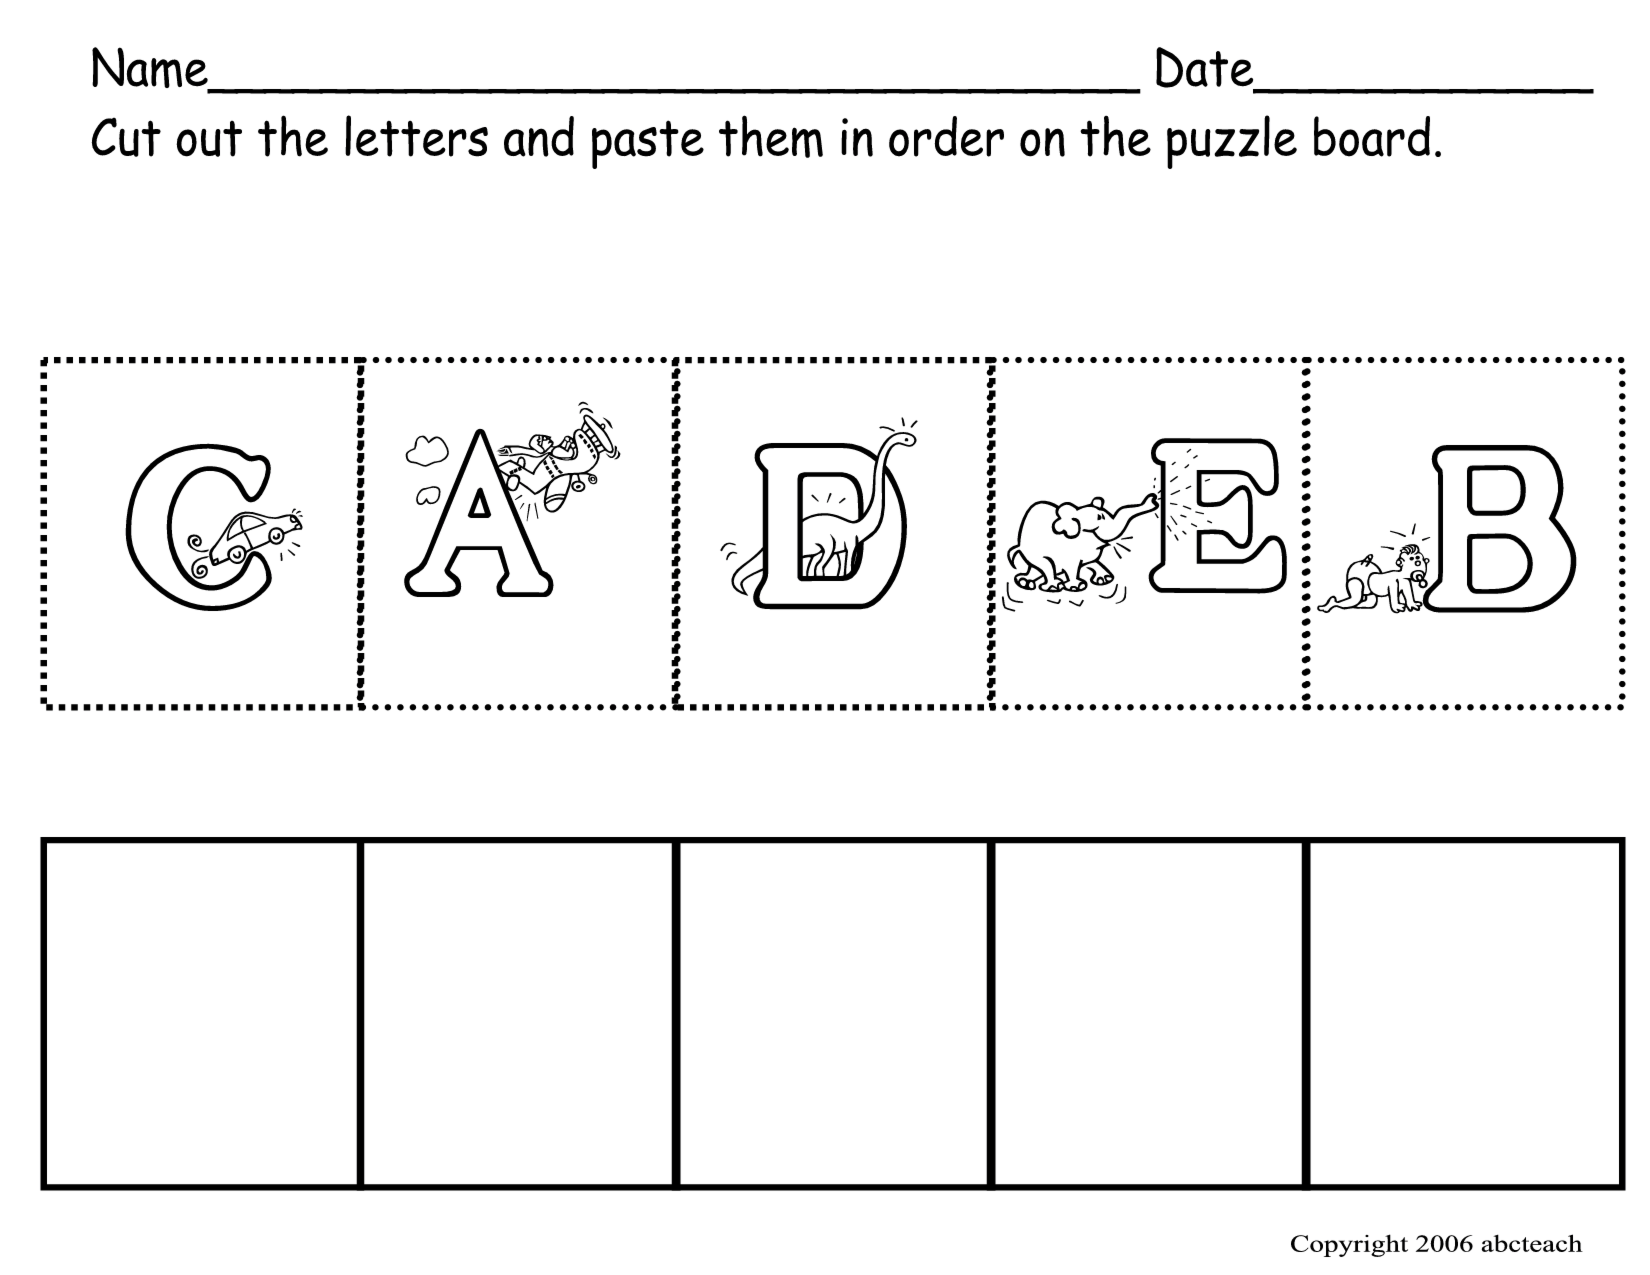 Alphabet Worksheets For Preschoolers Abc Preschool Pdf